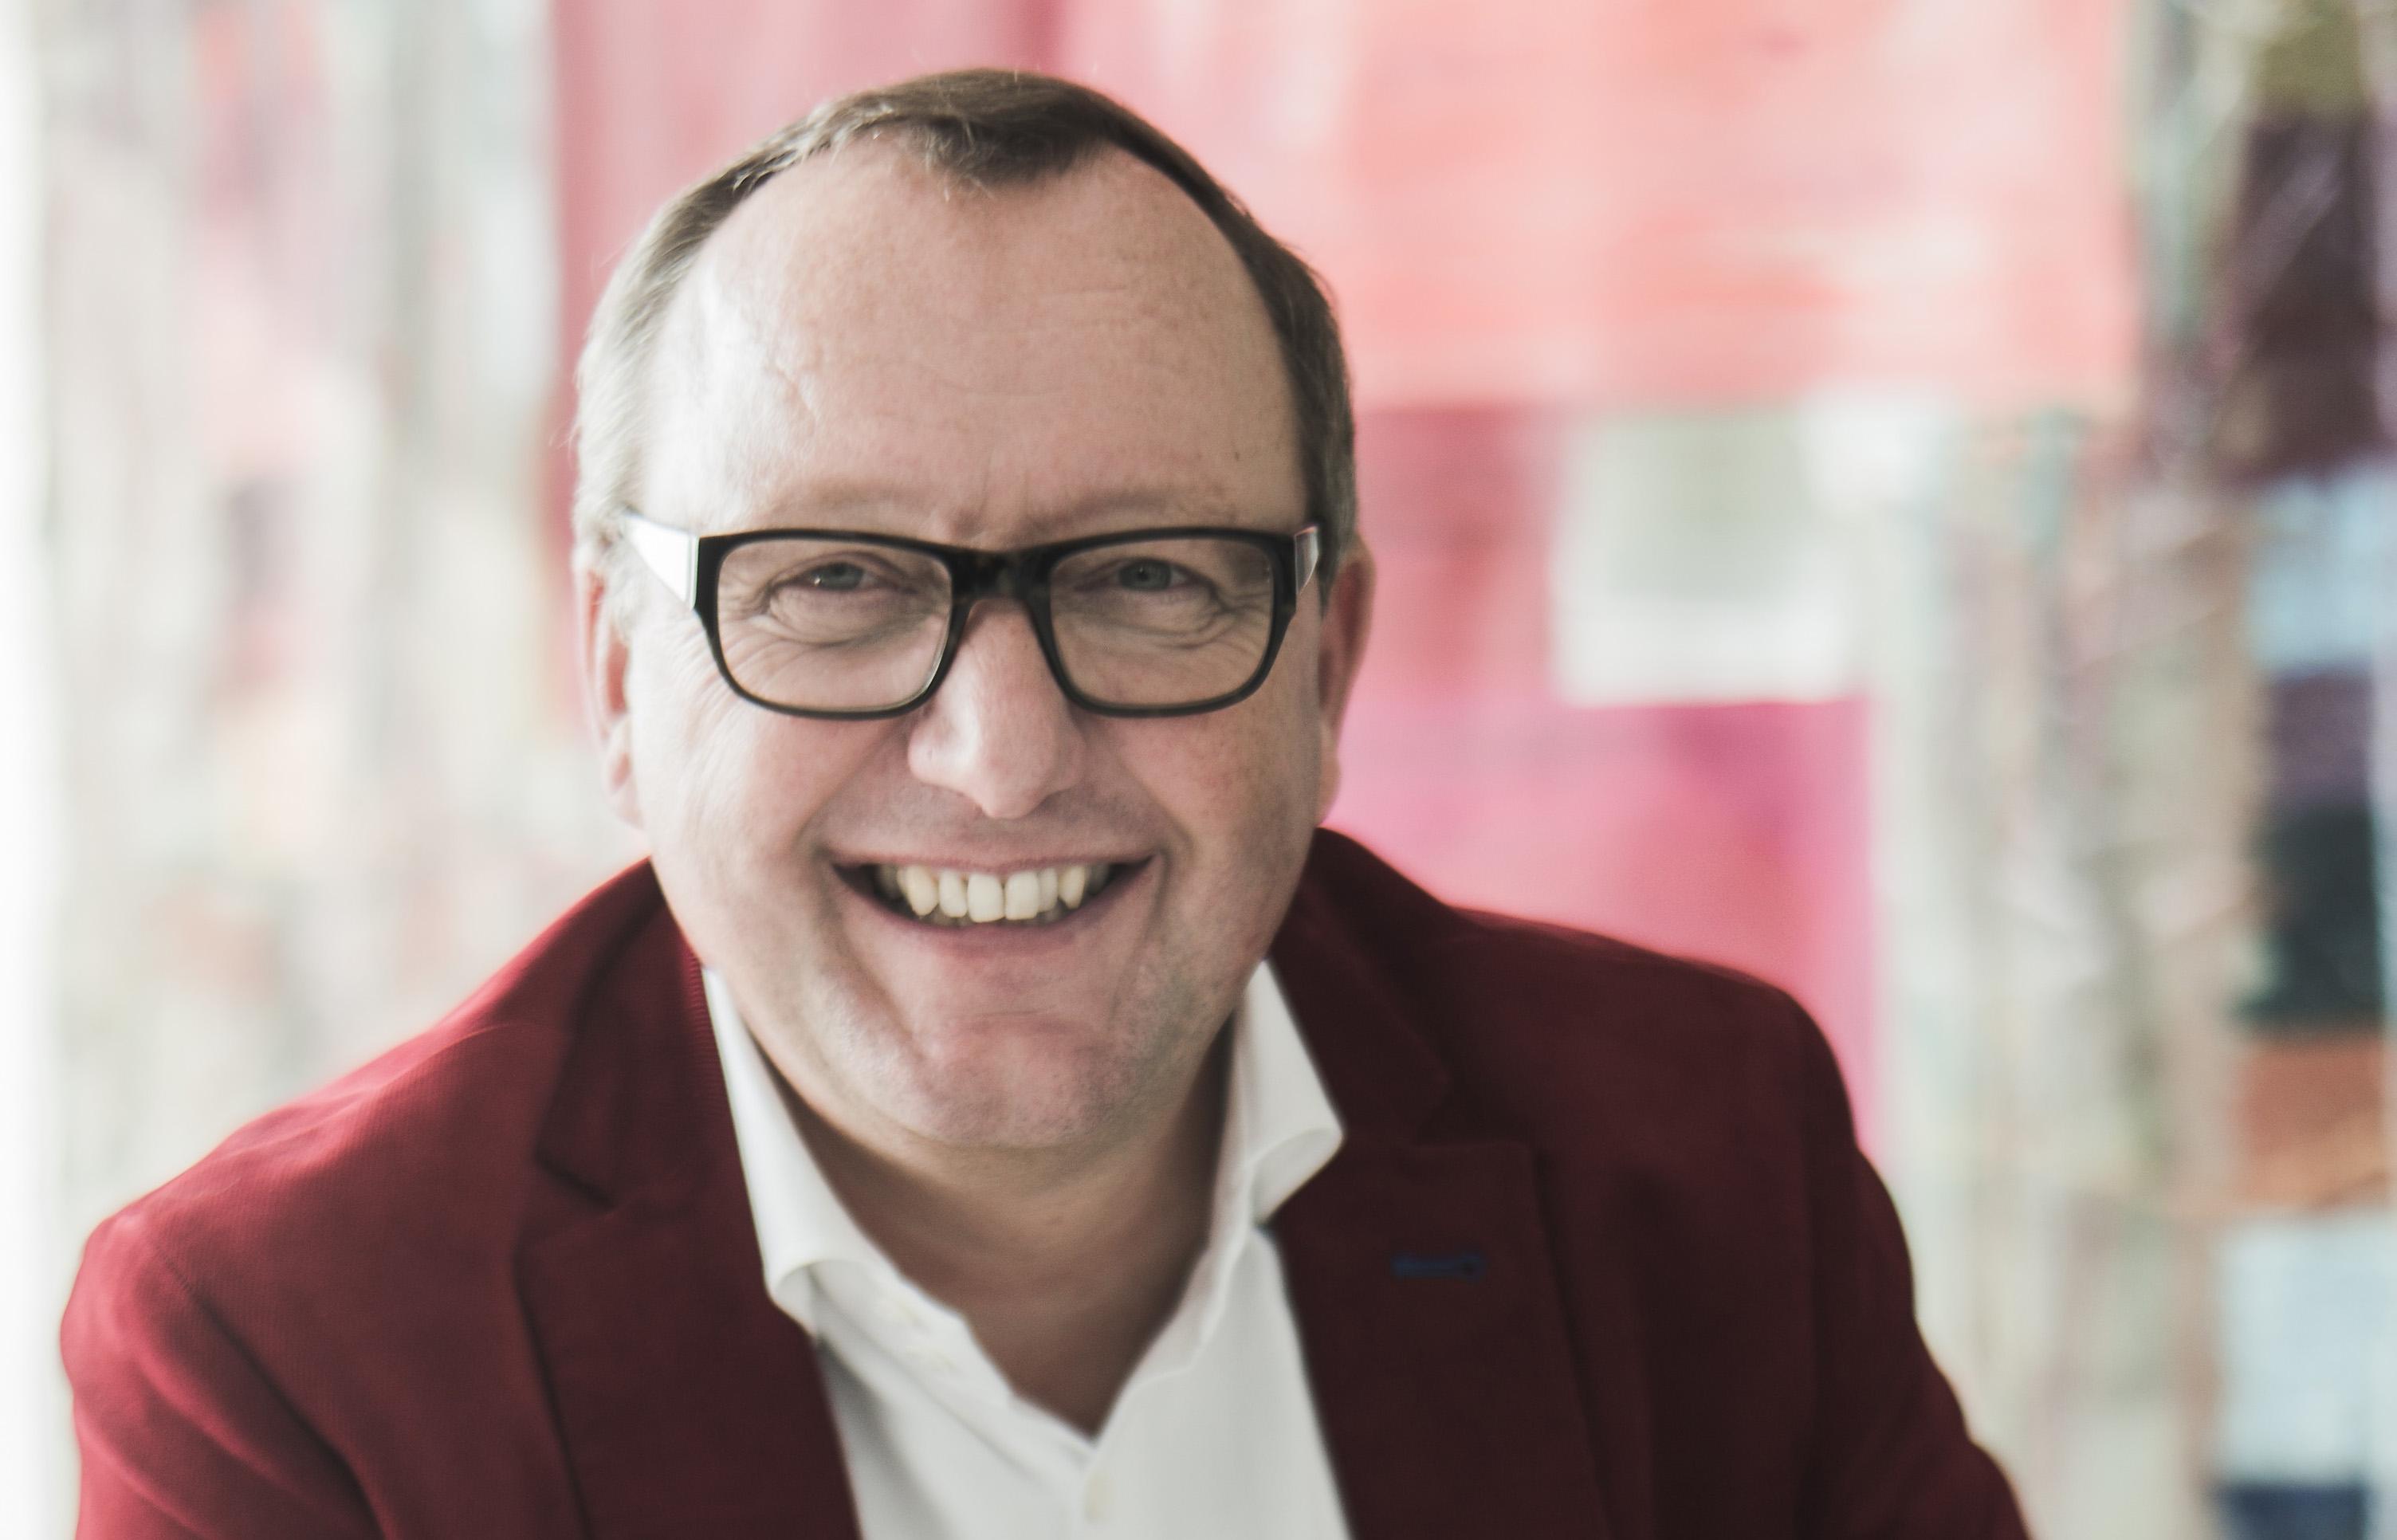 Digital-Evangelist Karl-Heinz Land